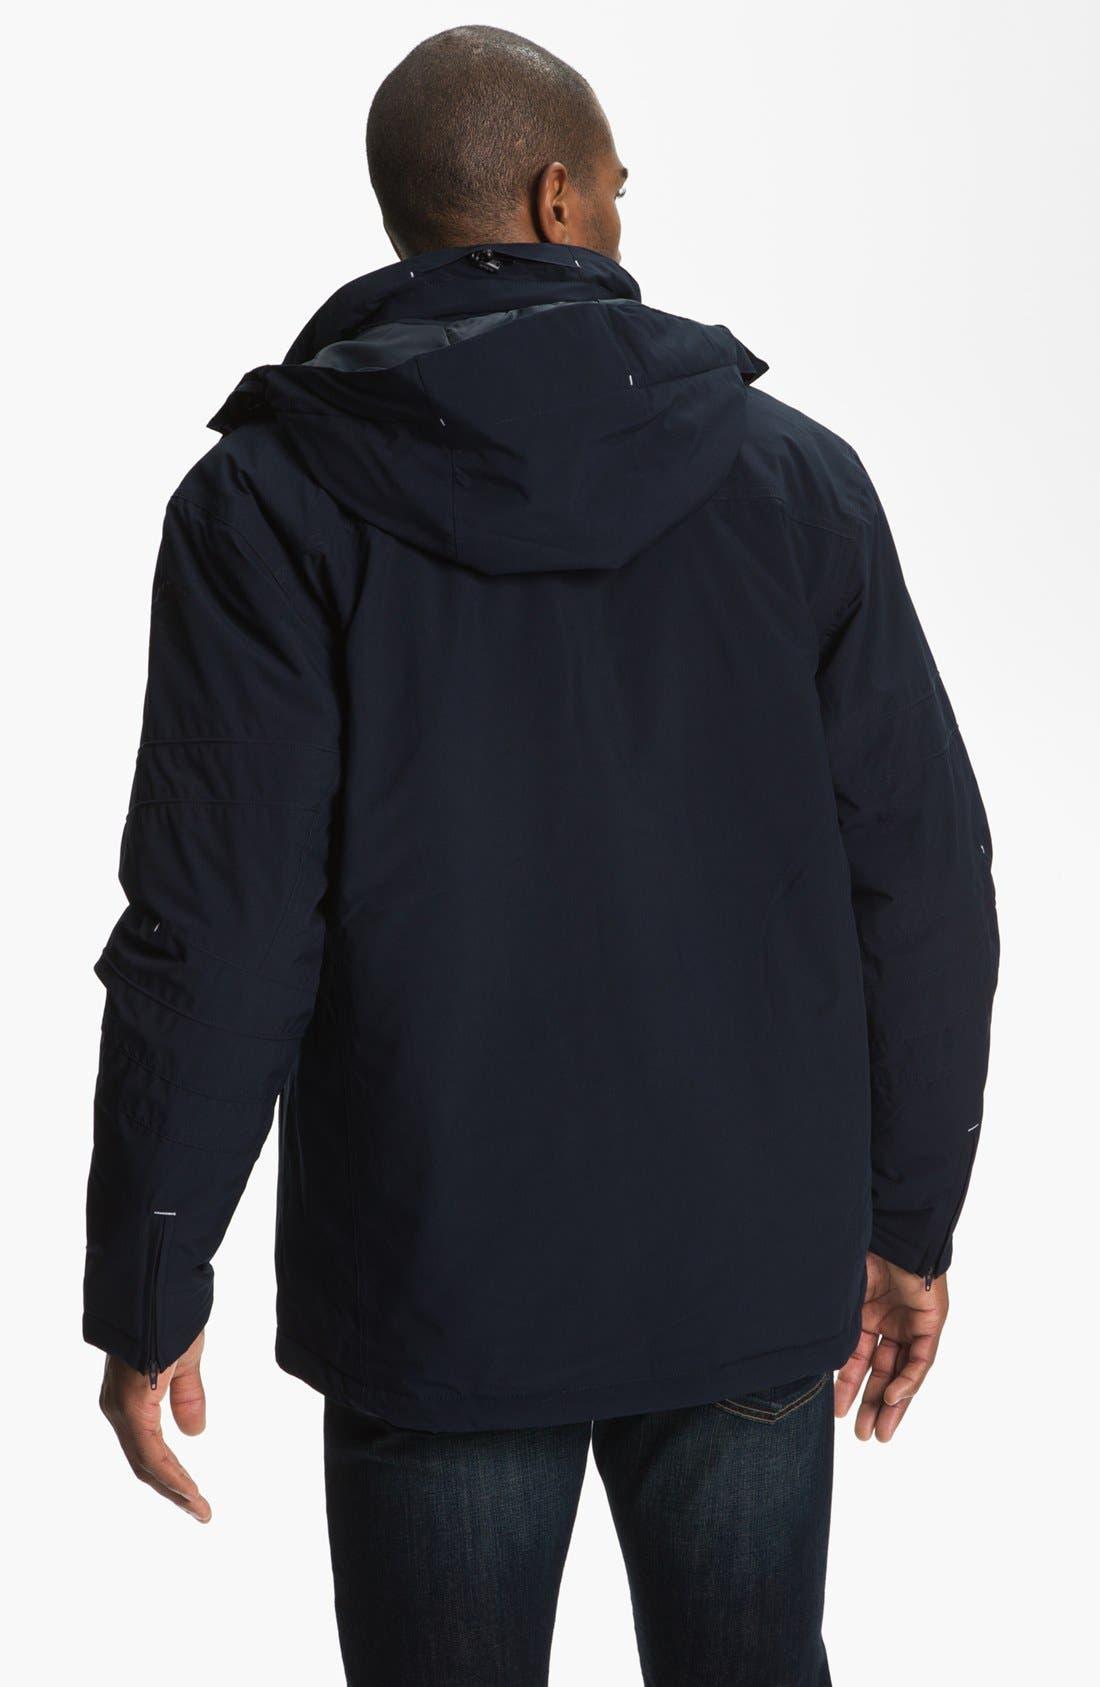 WeatherTec Sanders Jacket,                             Alternate thumbnail 4, color,                             420